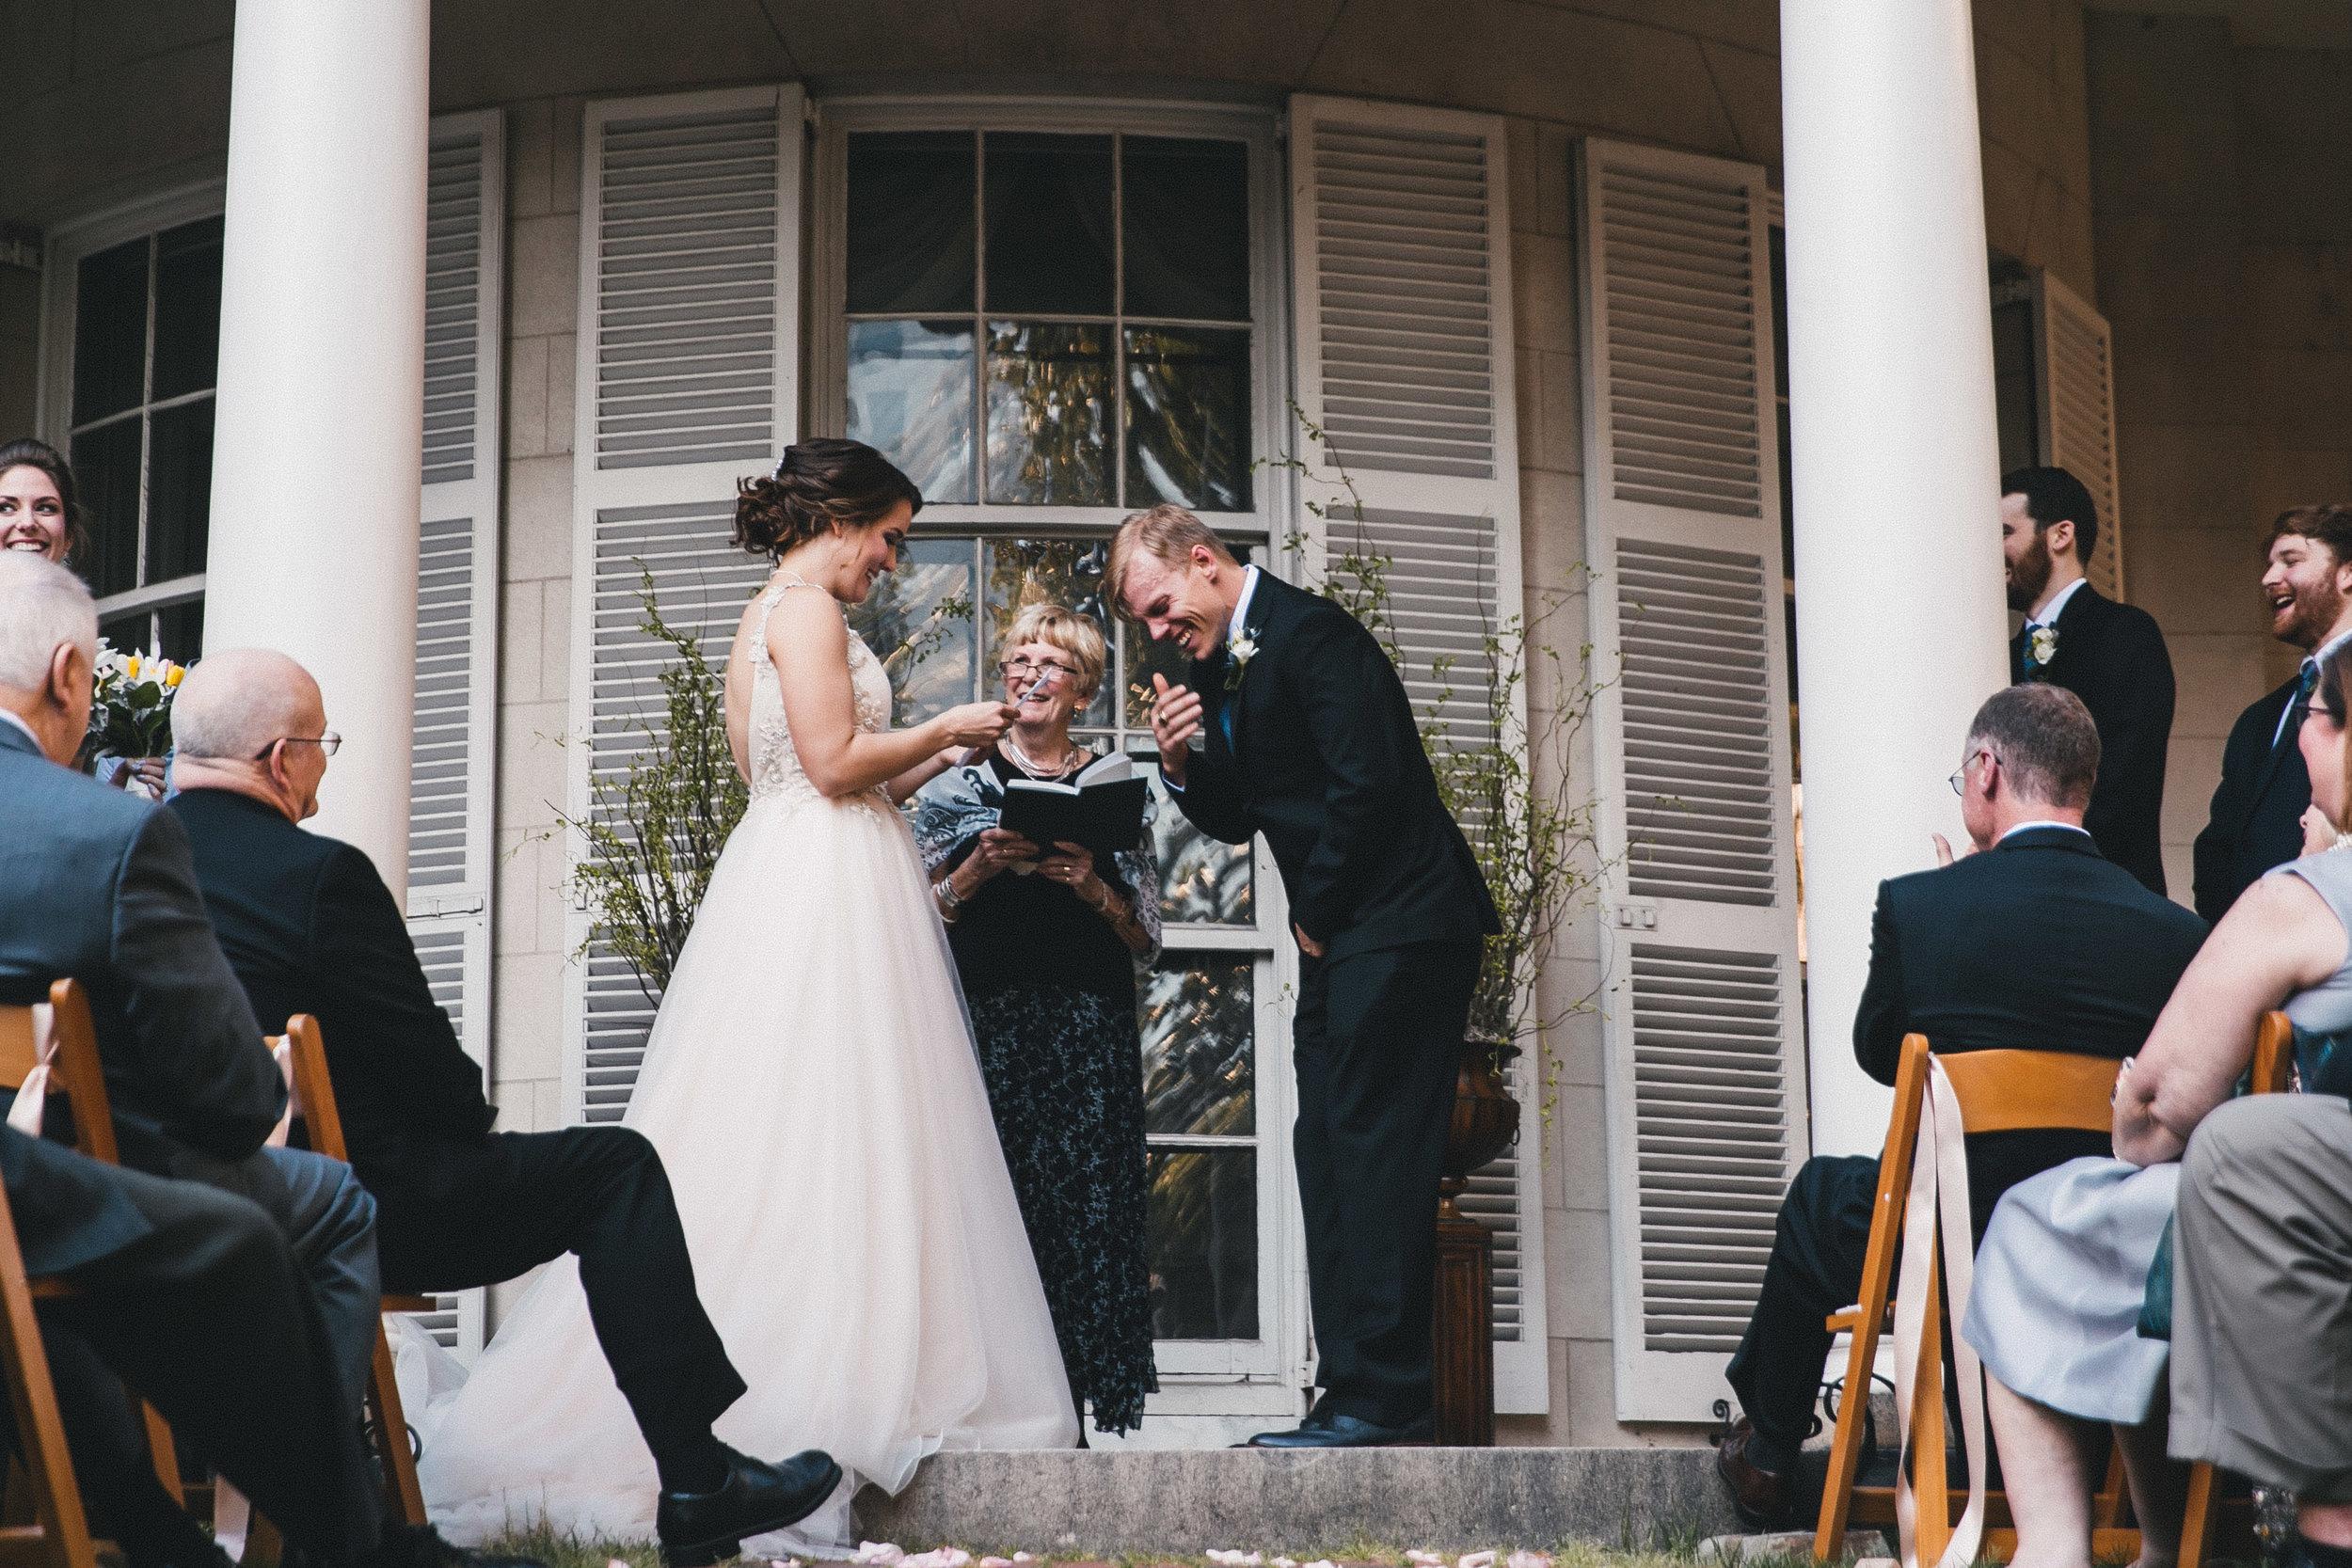 Lindsey & Bert - Wedding 4.1.17-648.jpg